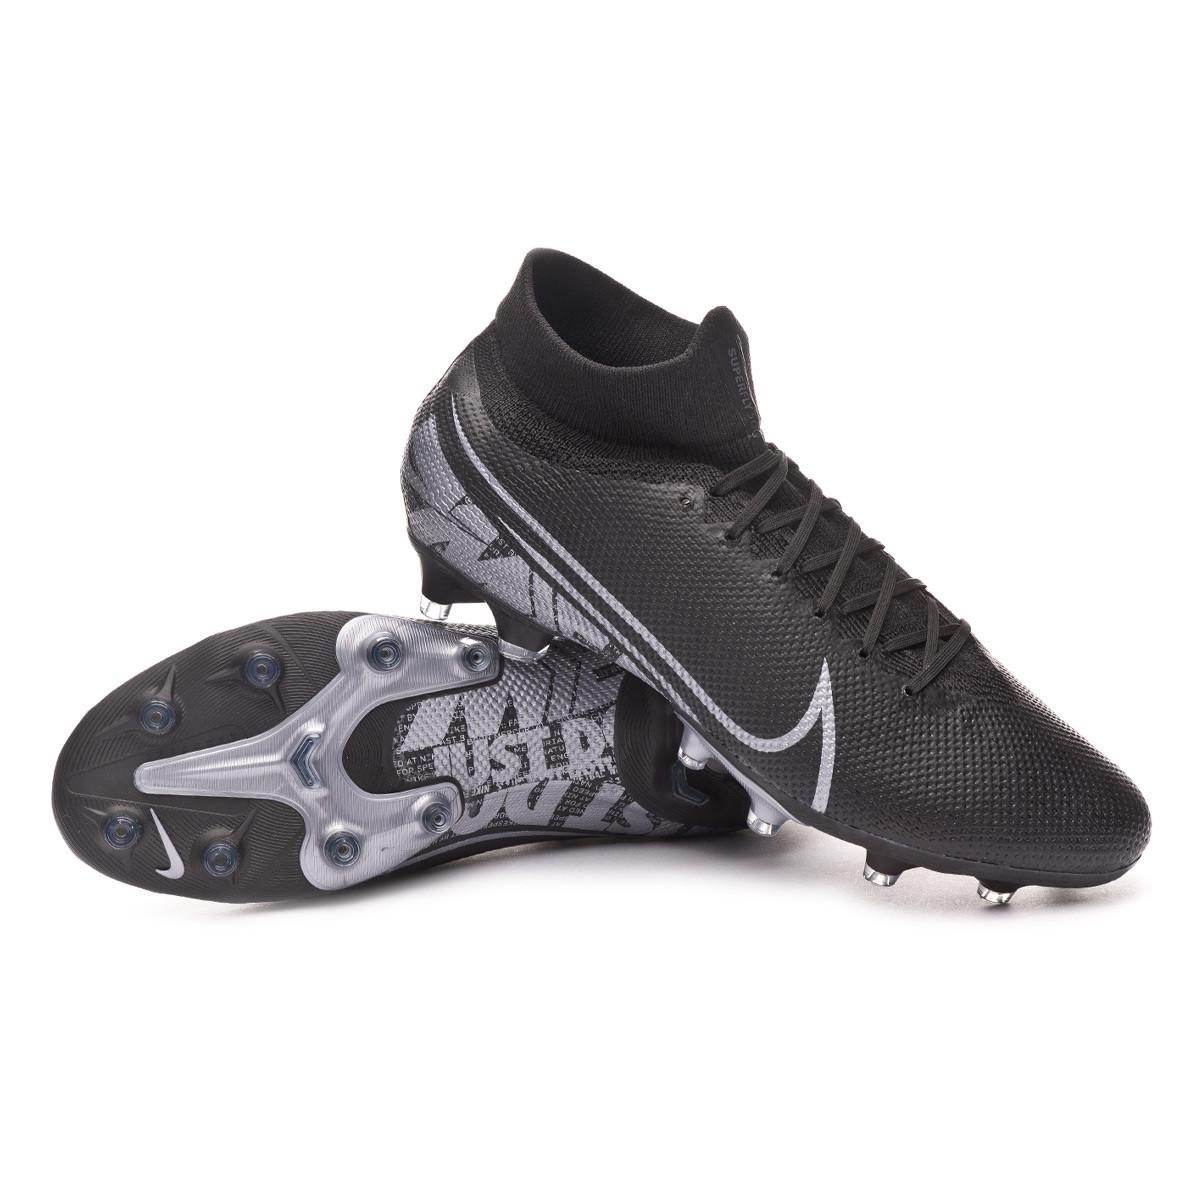 Chuteira Nike Mercurial Superfly VII Pro AG Pro